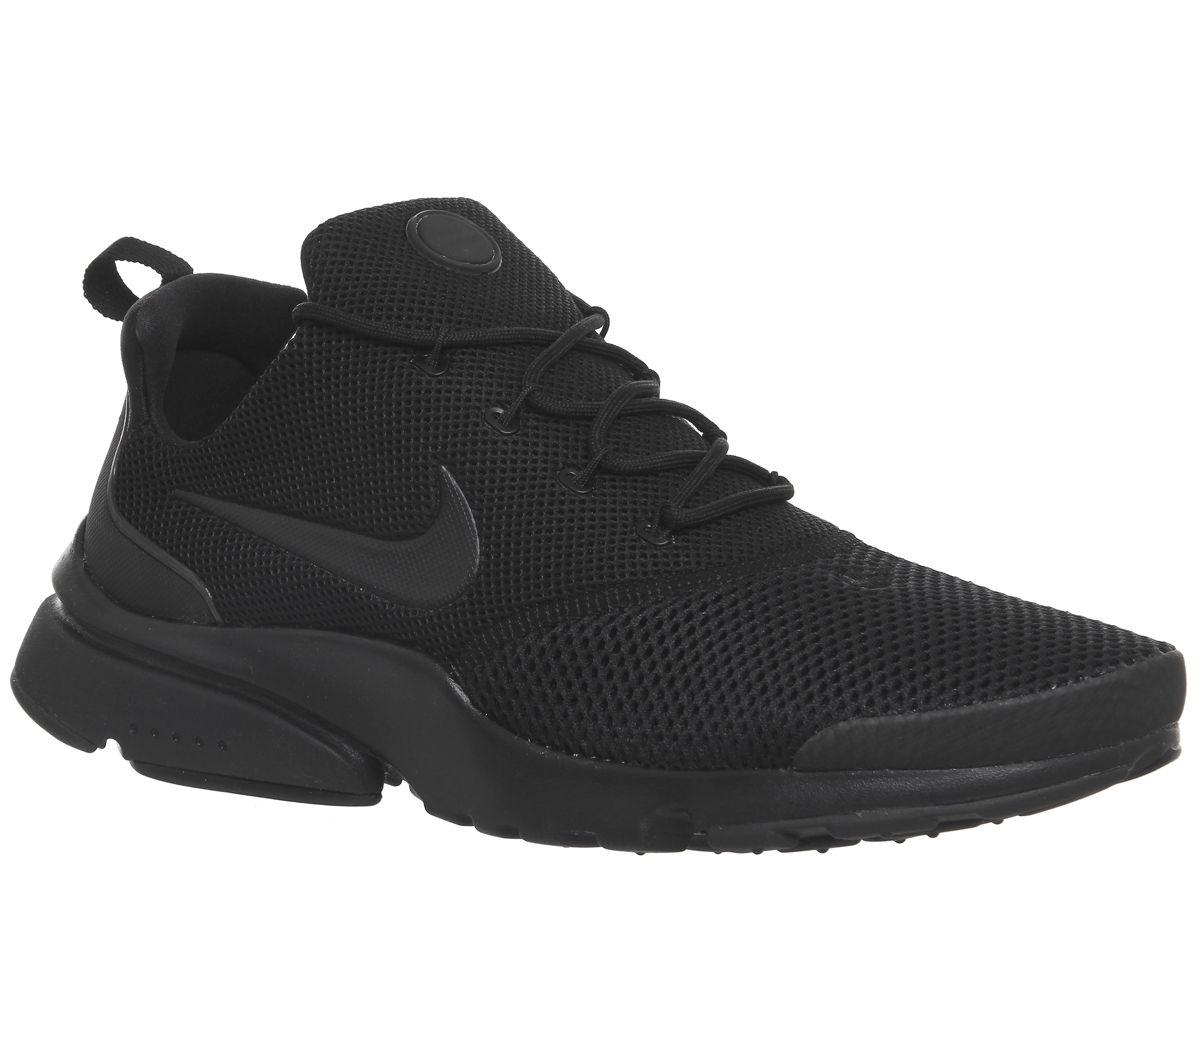 d0cc45f6ff15 Nike Presto Fly Trainers Triple Black - His trainers